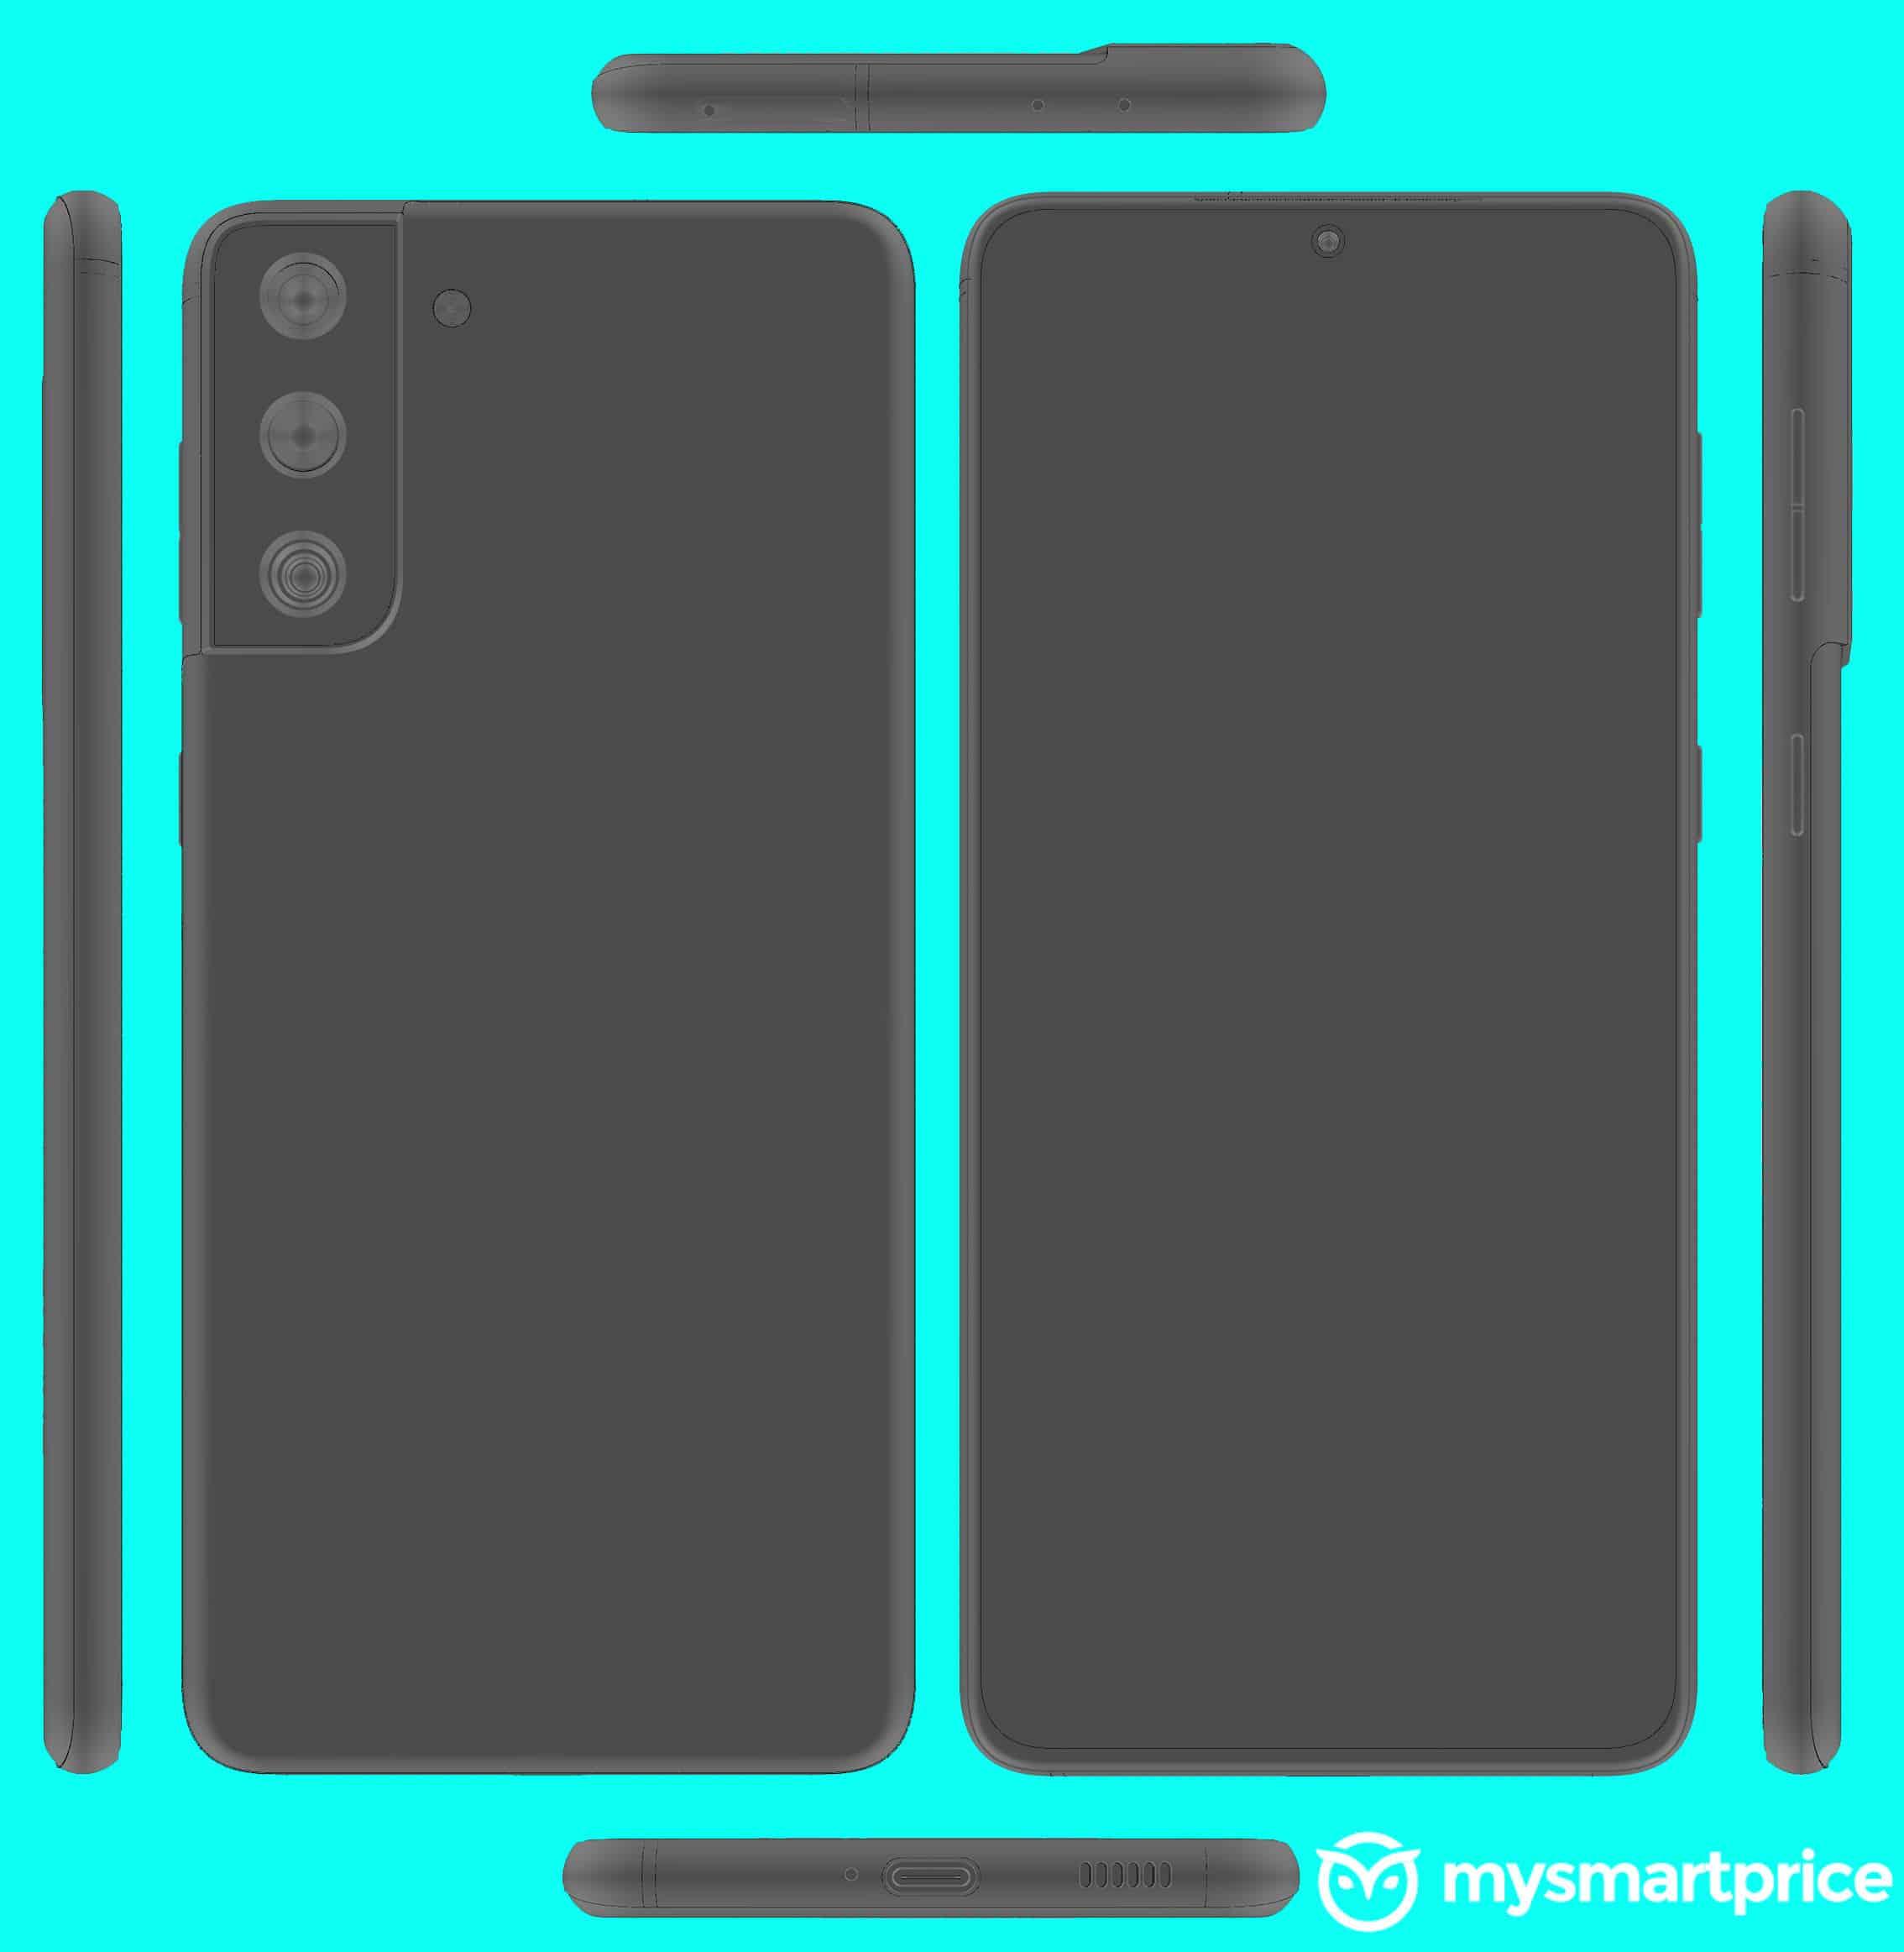 Samsung Galaxy 21 image render leak 2